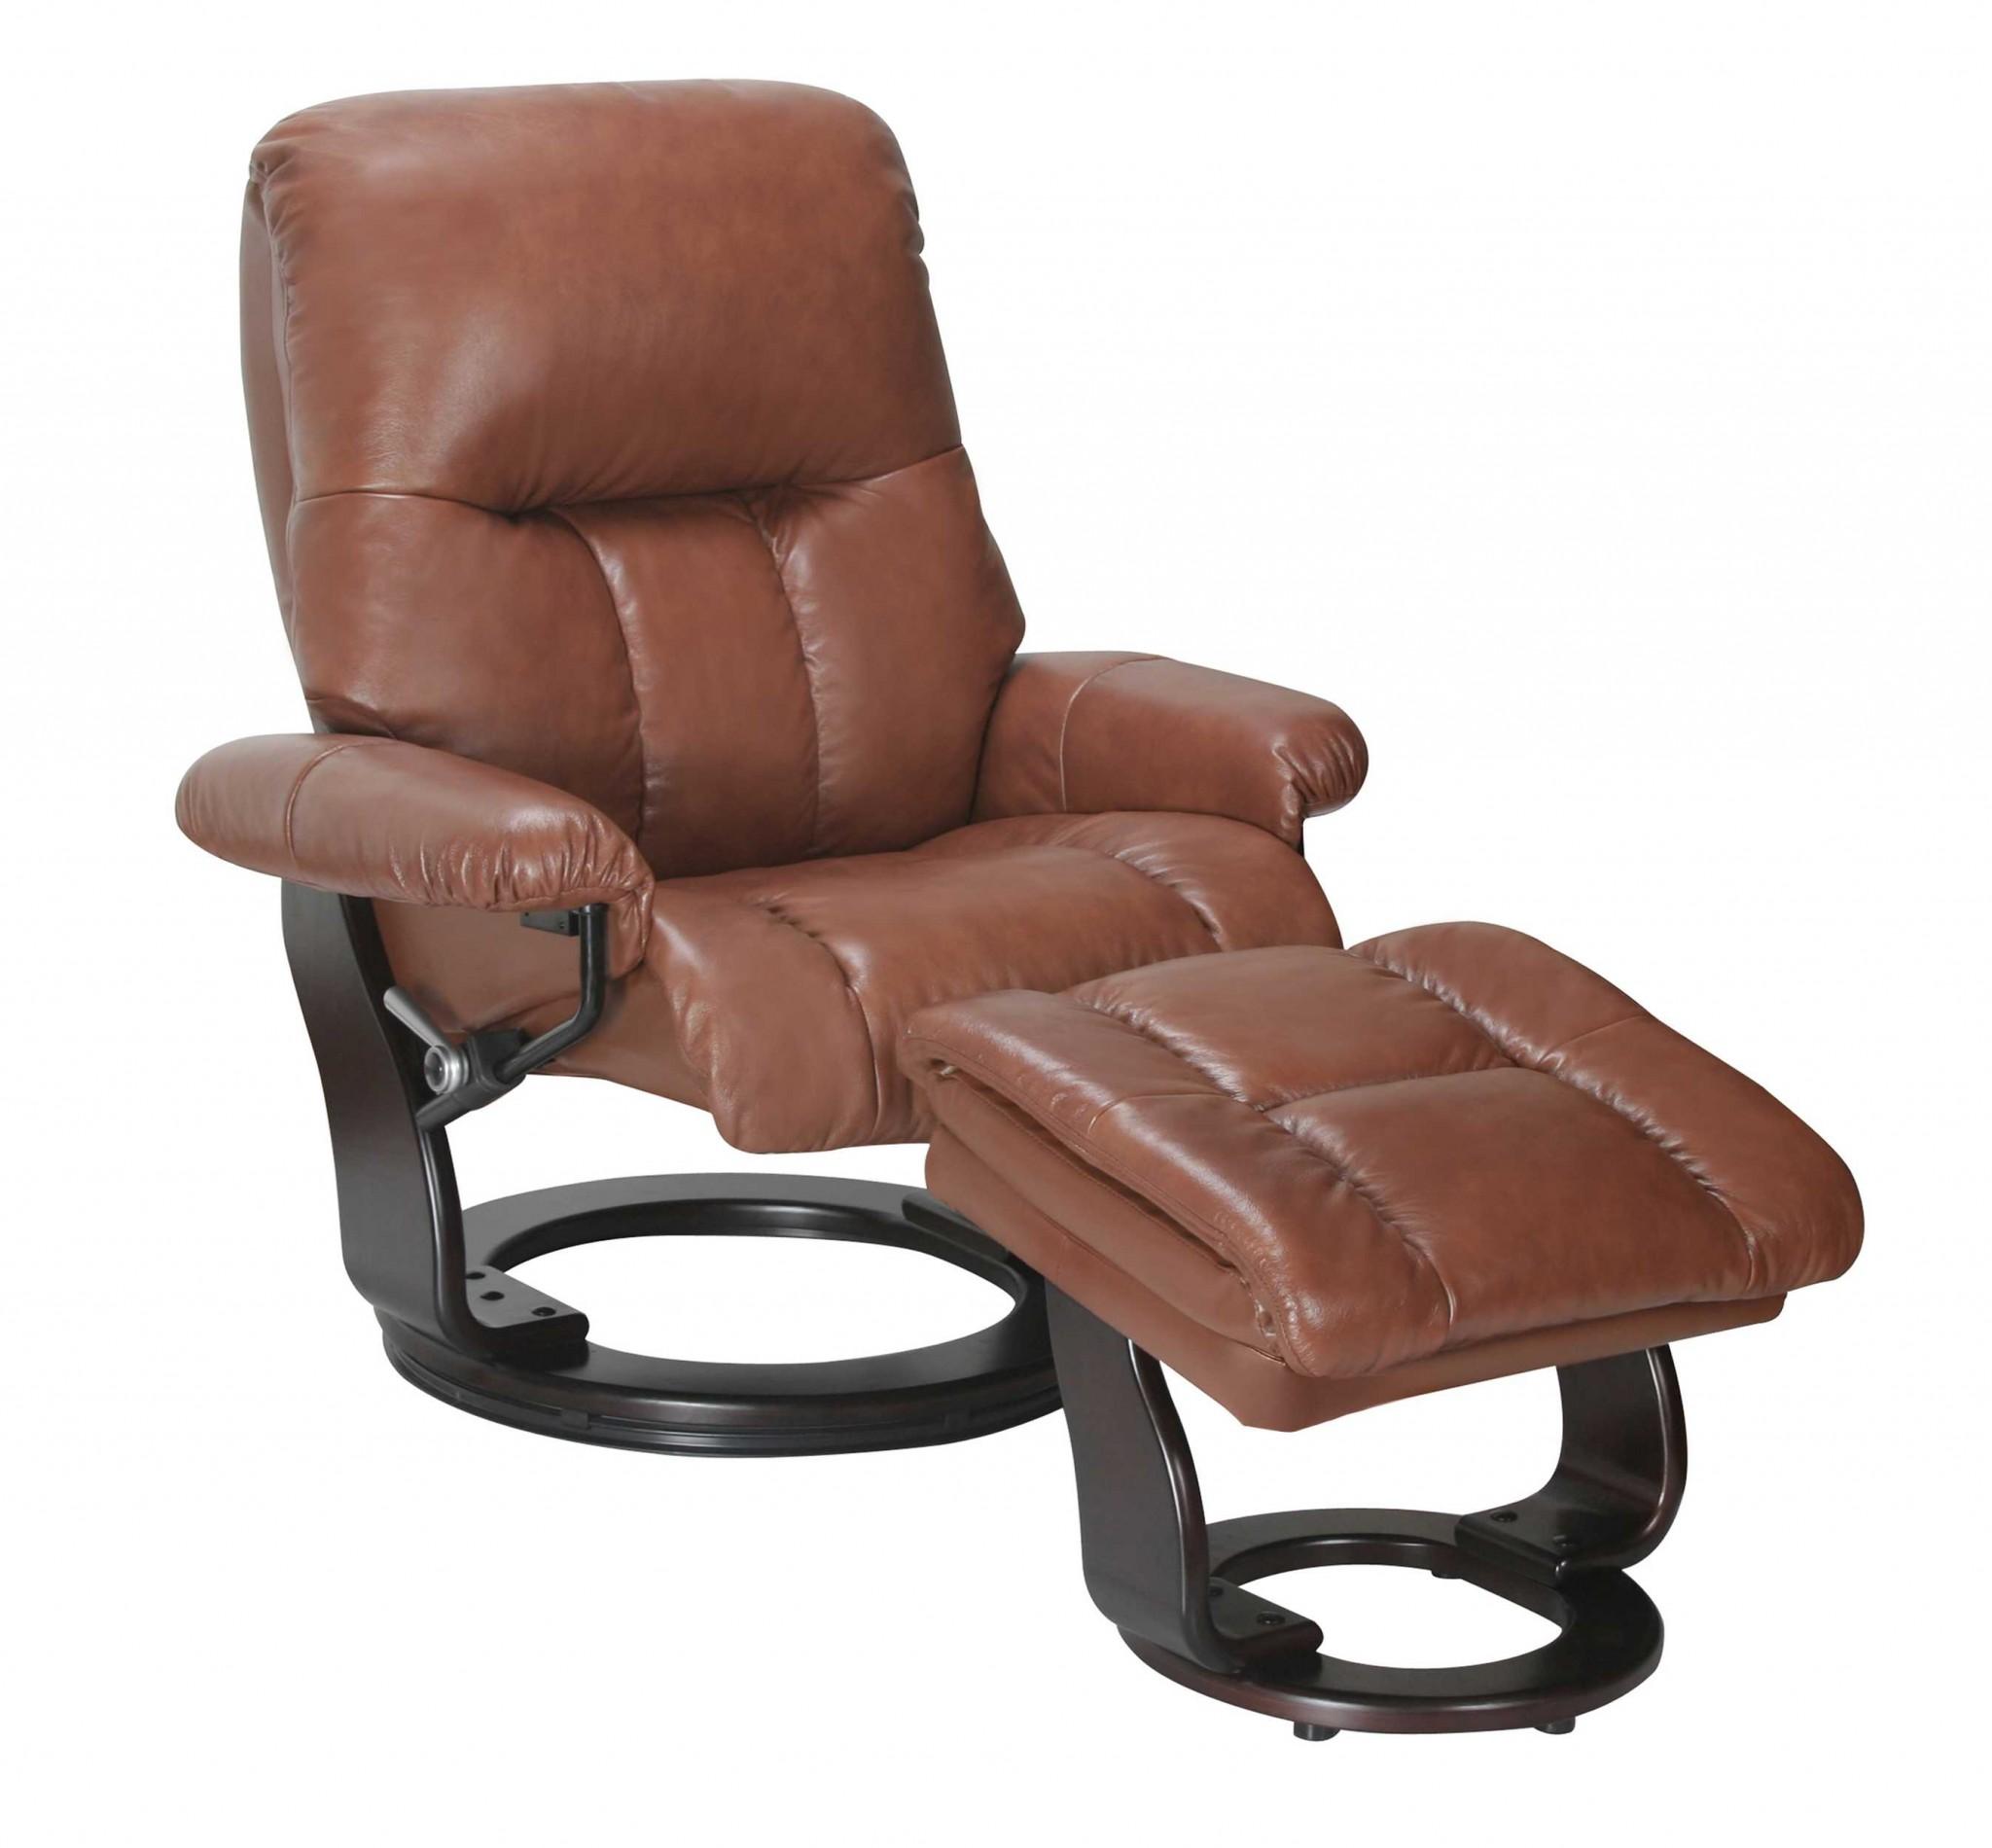 "35"" x 31"" x 40.5"" Llama Cover- Leather & Vinyl match Recliner Chair & Ottoman"